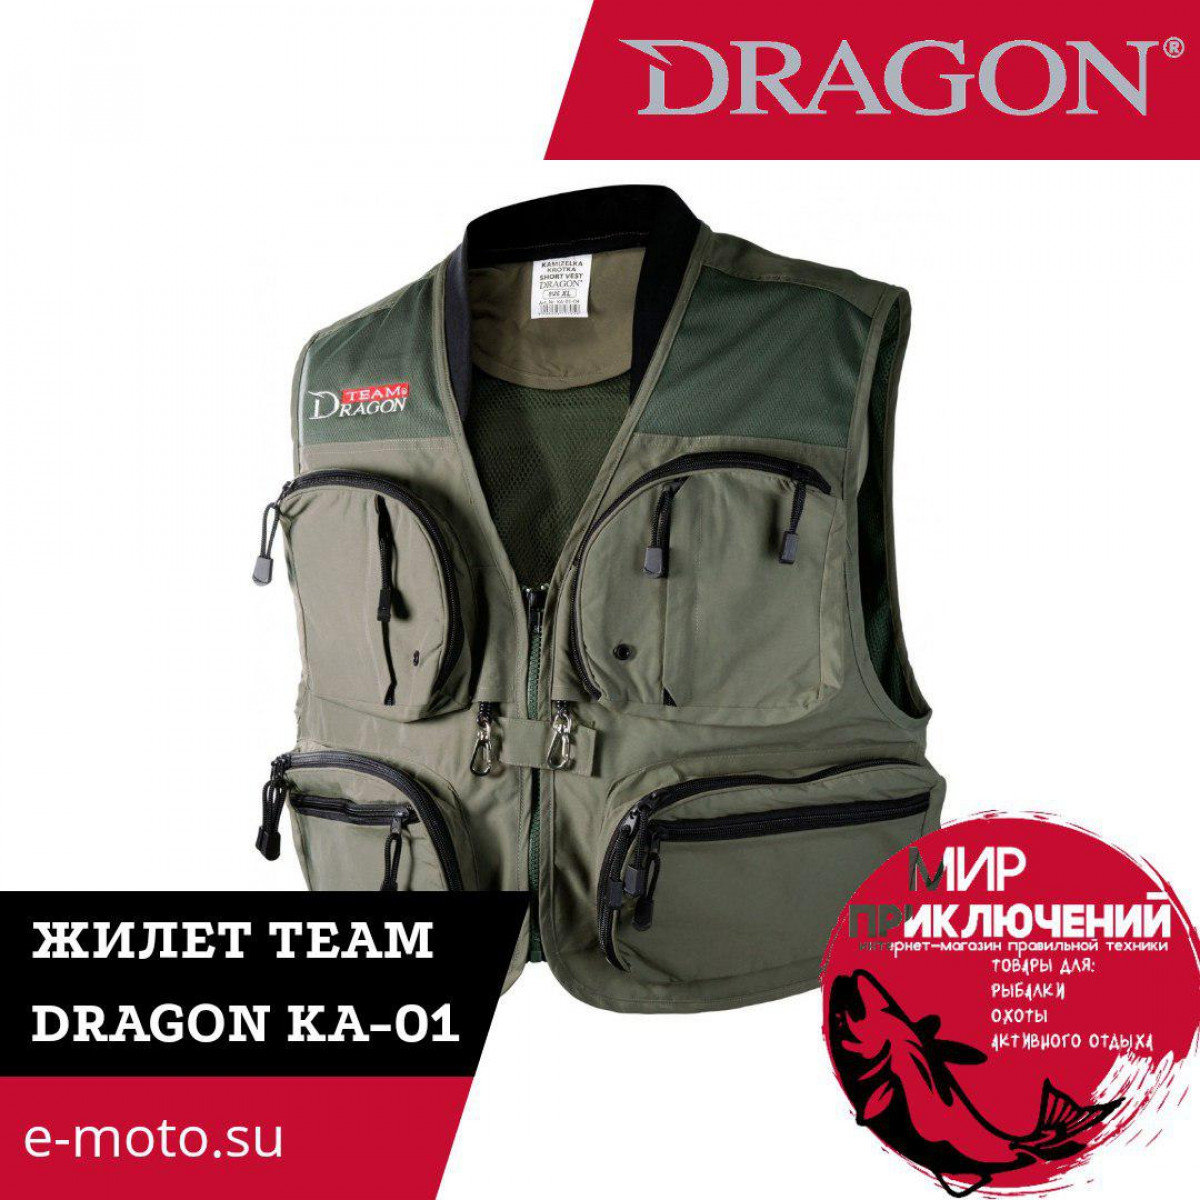 Жилет Team Dragon KA-01